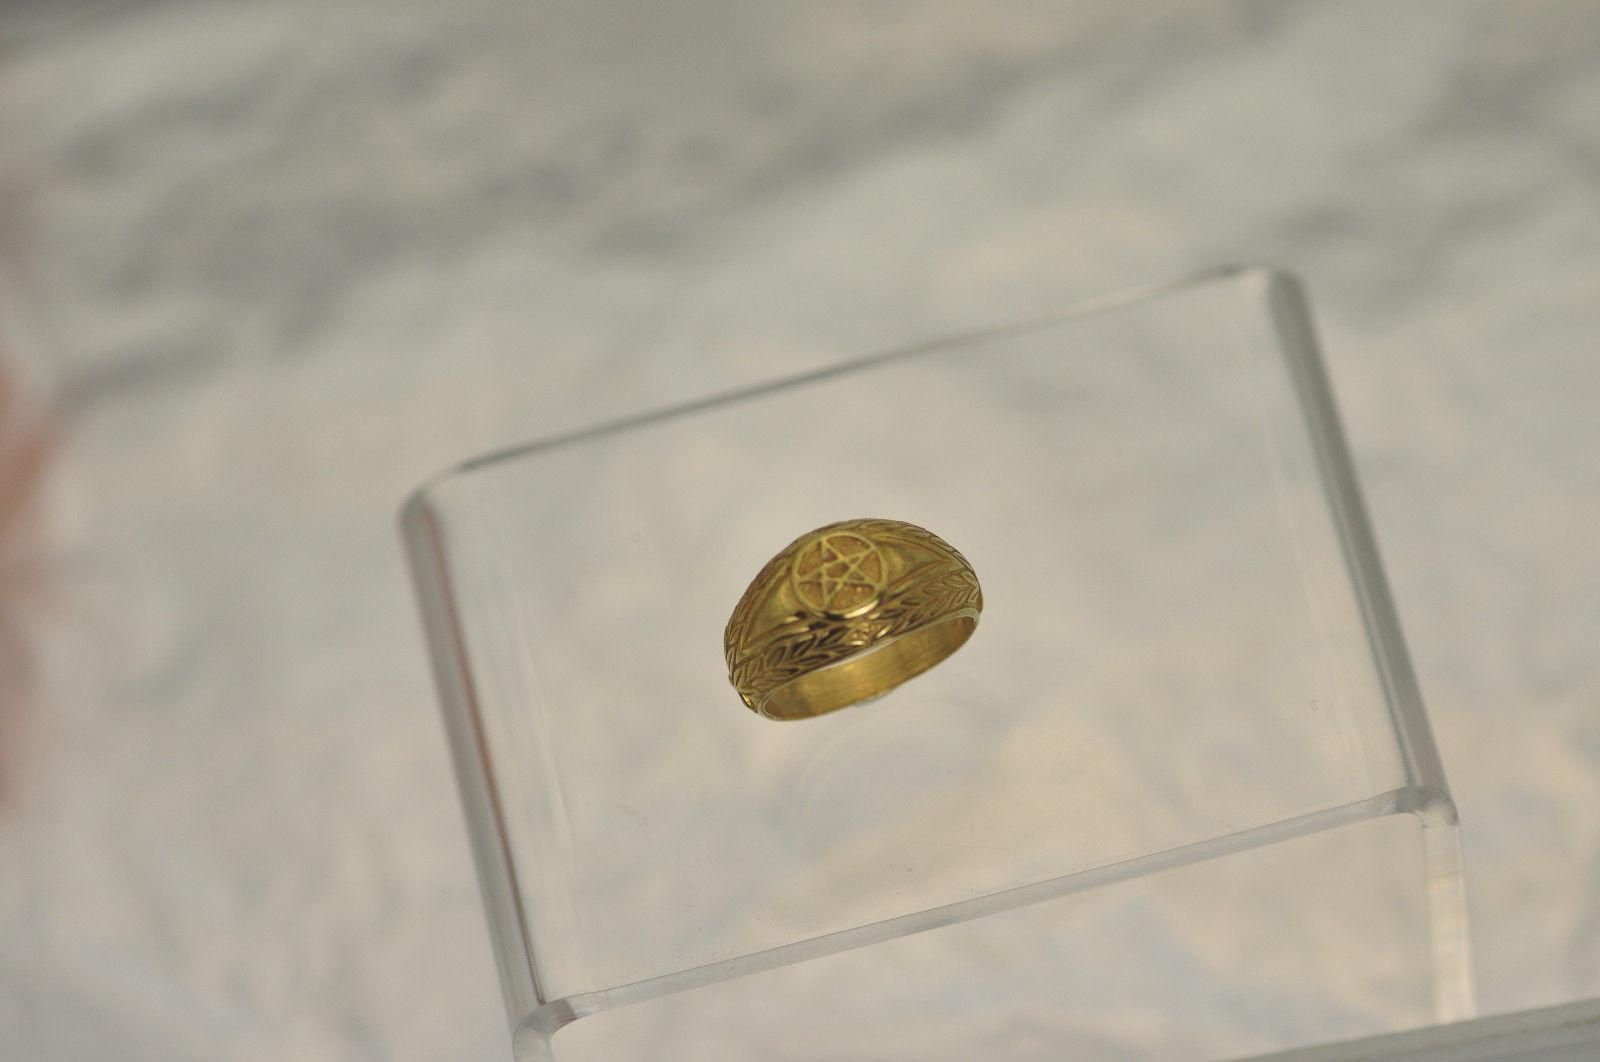 New 24K Yellow Gold Plated Celtic Dragon Evil Eye ring Pentagram Jewelry Pick SZ